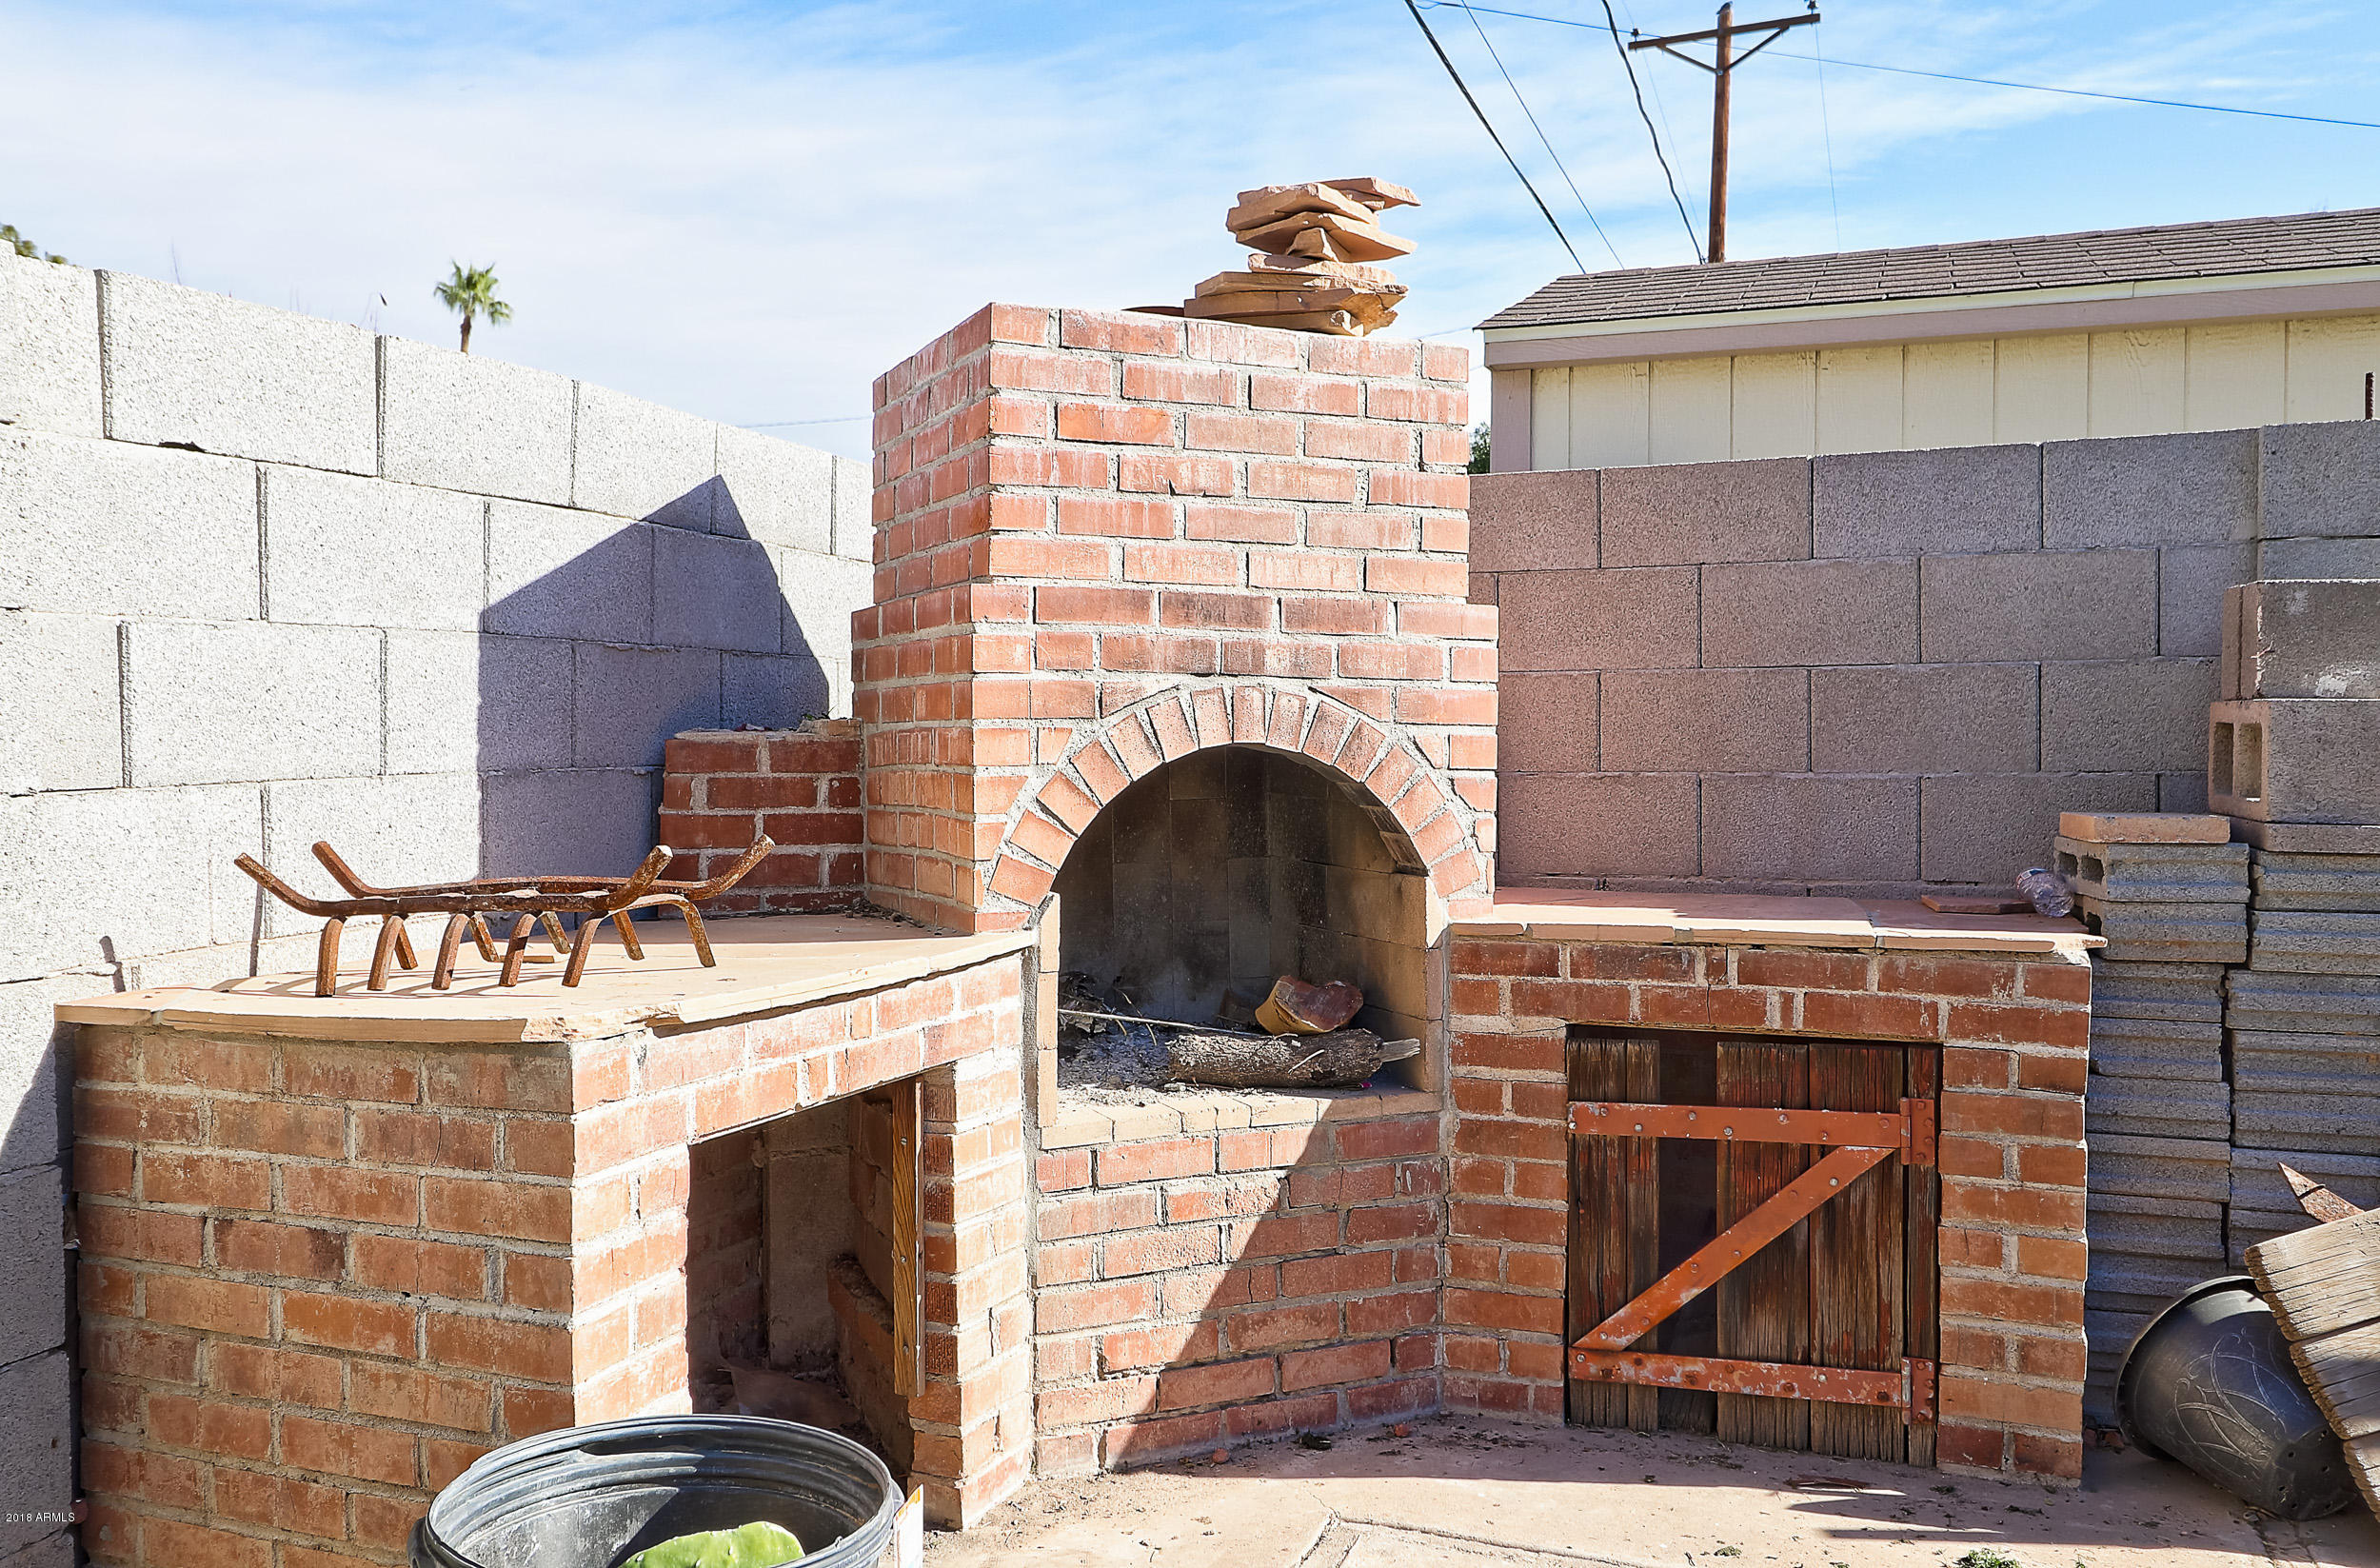 MLS 5859242 8114 E FAIRMOUNT Avenue, Scottsdale, AZ 85251 Scottsdale AZ Scottsdale Estates